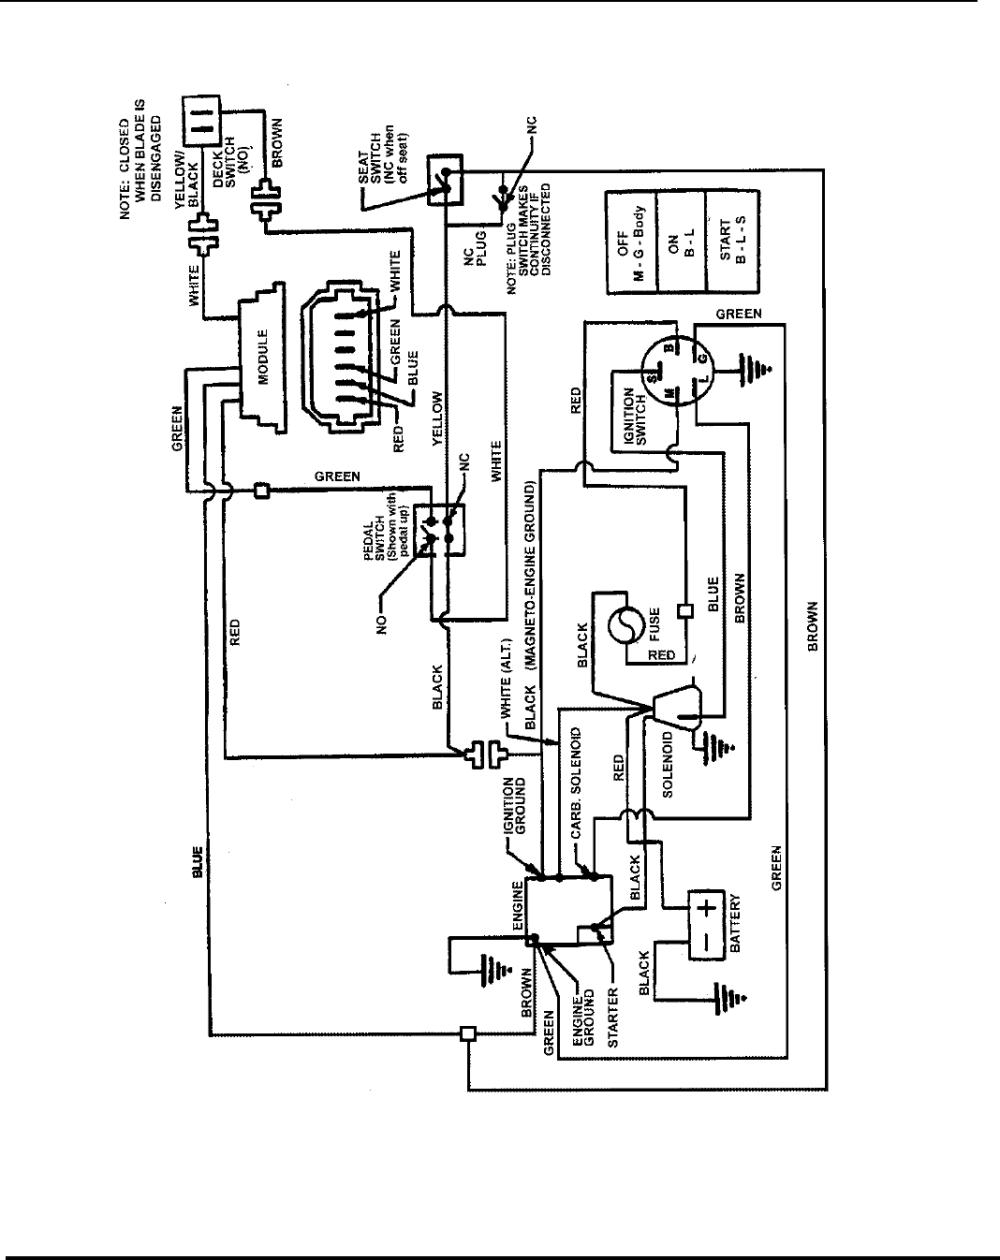 medium resolution of melex 212 wiring diagram online wiring diagrammelex 252 wiring diagrams schematic diagrammelex 252 golf cart wiring